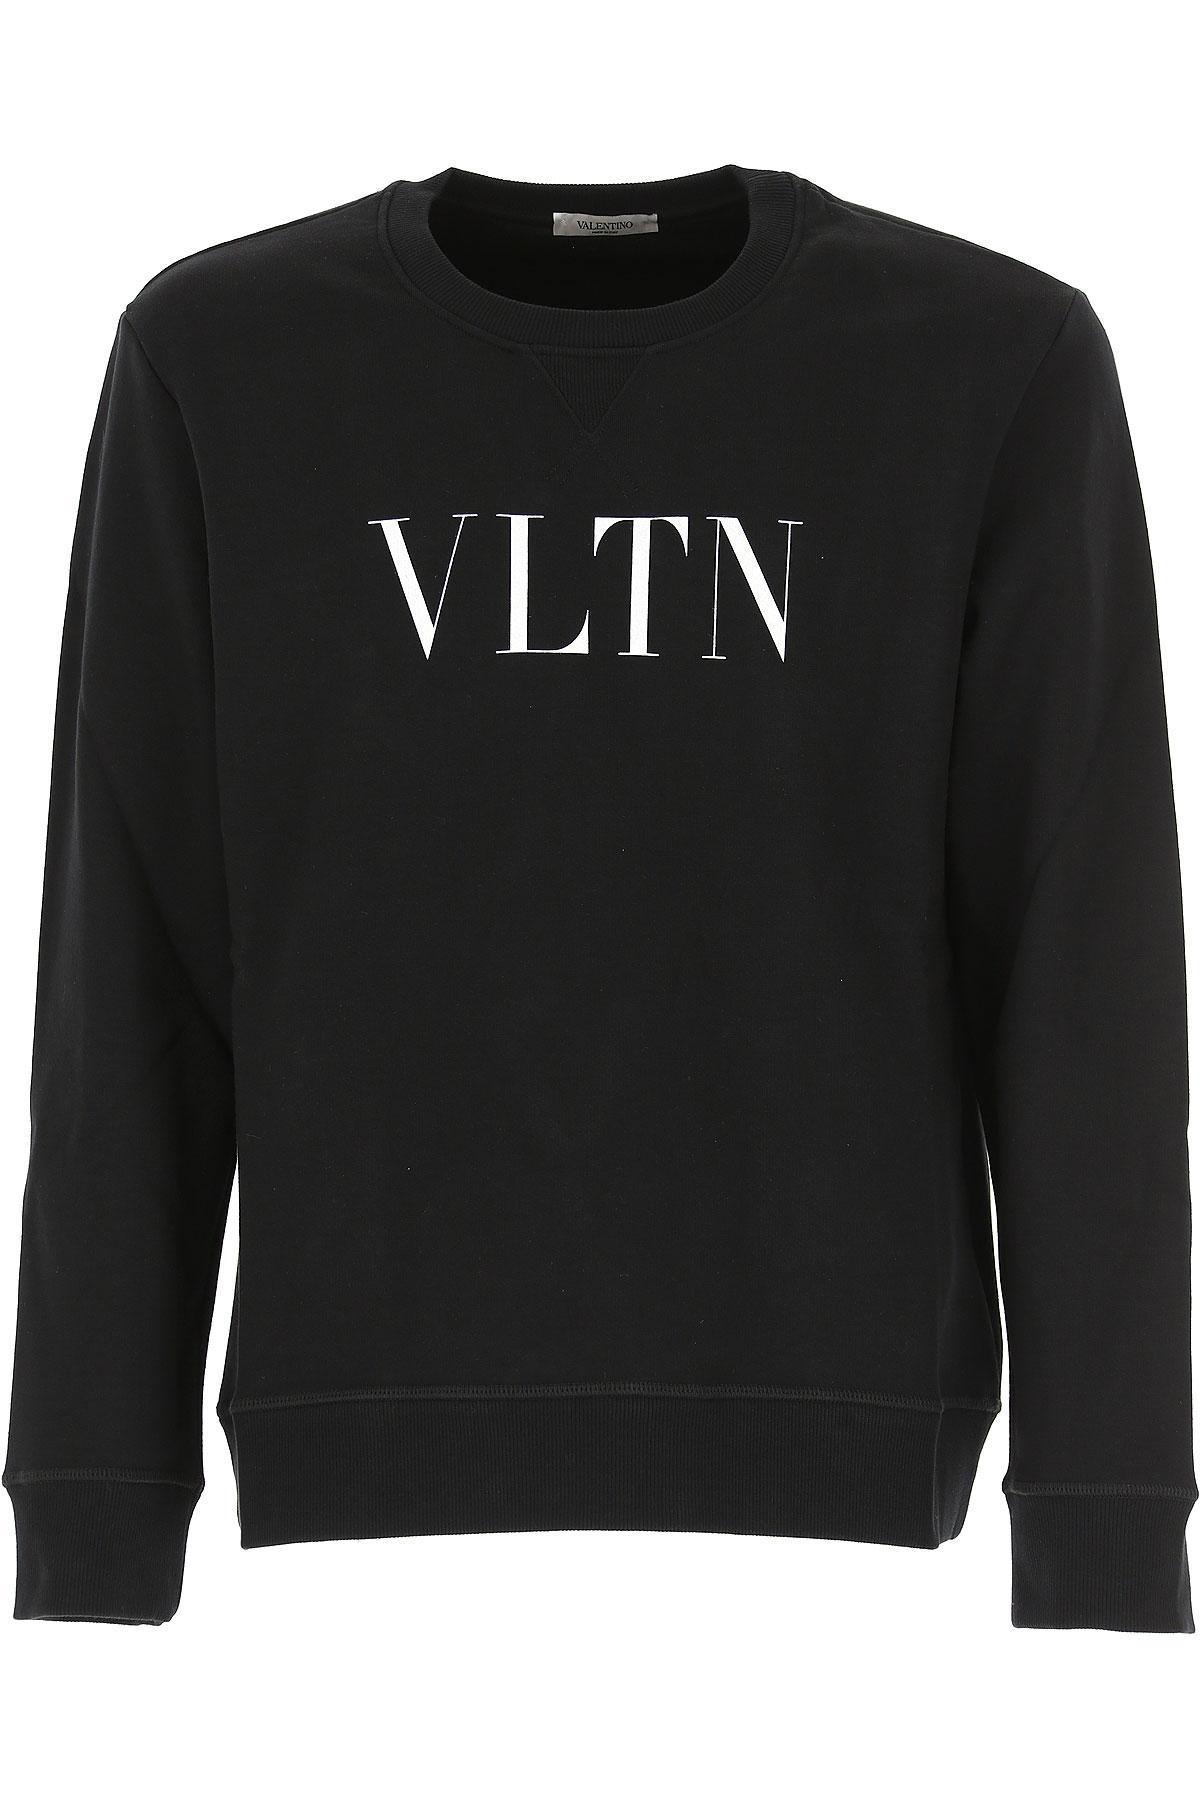 Valentino Sweatshirt for Men, Black, Cotton, 2017, L M S XL USA-468302